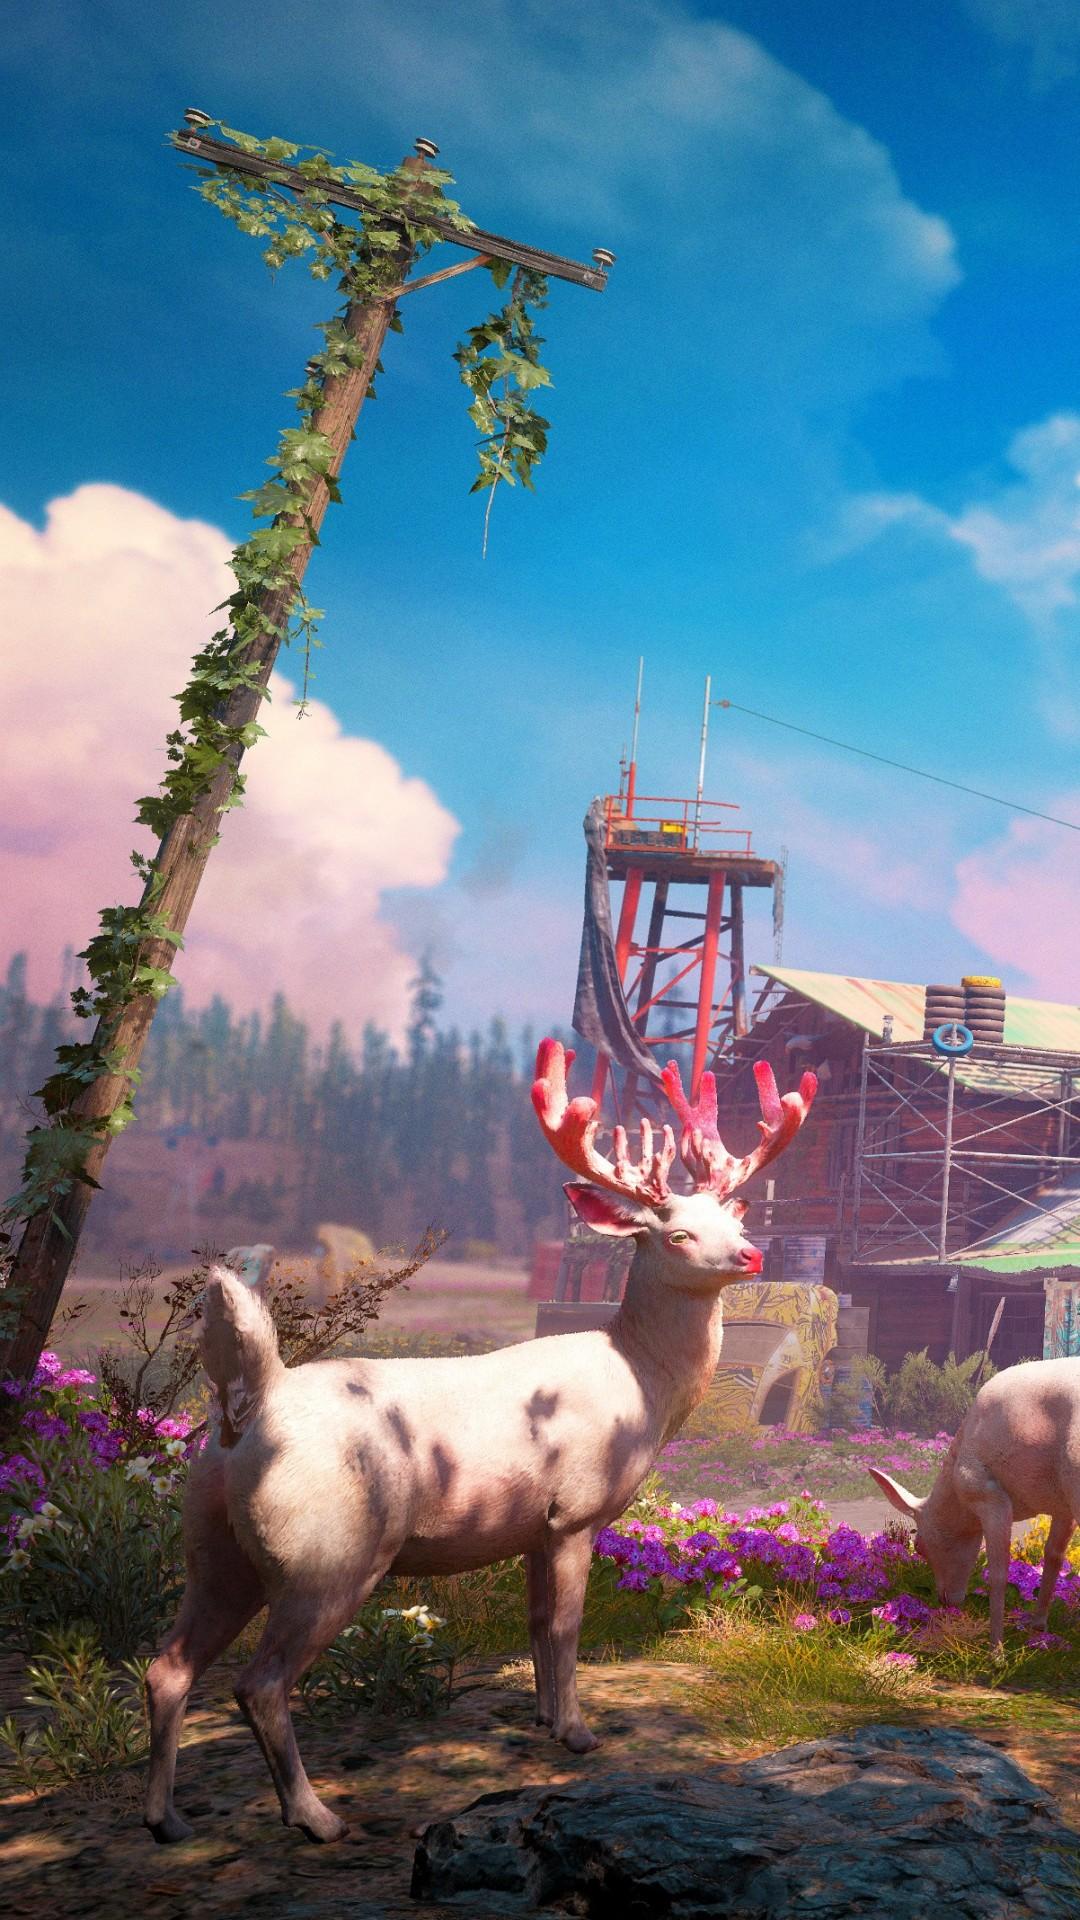 Wallpaper Far Cry New Dawn screenshot 4K Games 21007